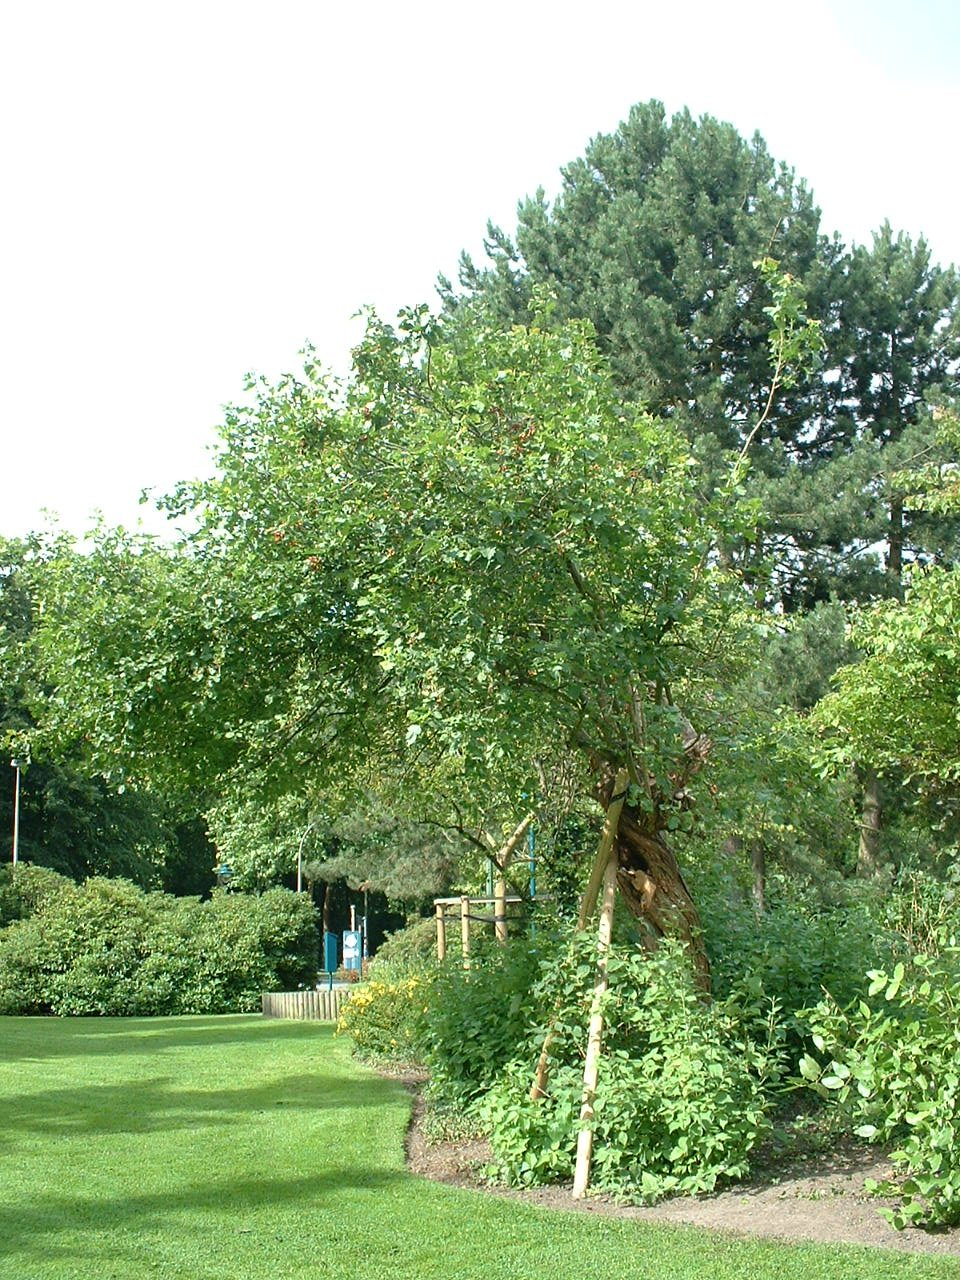 Crataegus mollis – Watermael-Boitsfort, Parc Seny, Boulevard du Souverain –  19 Juillet 2002